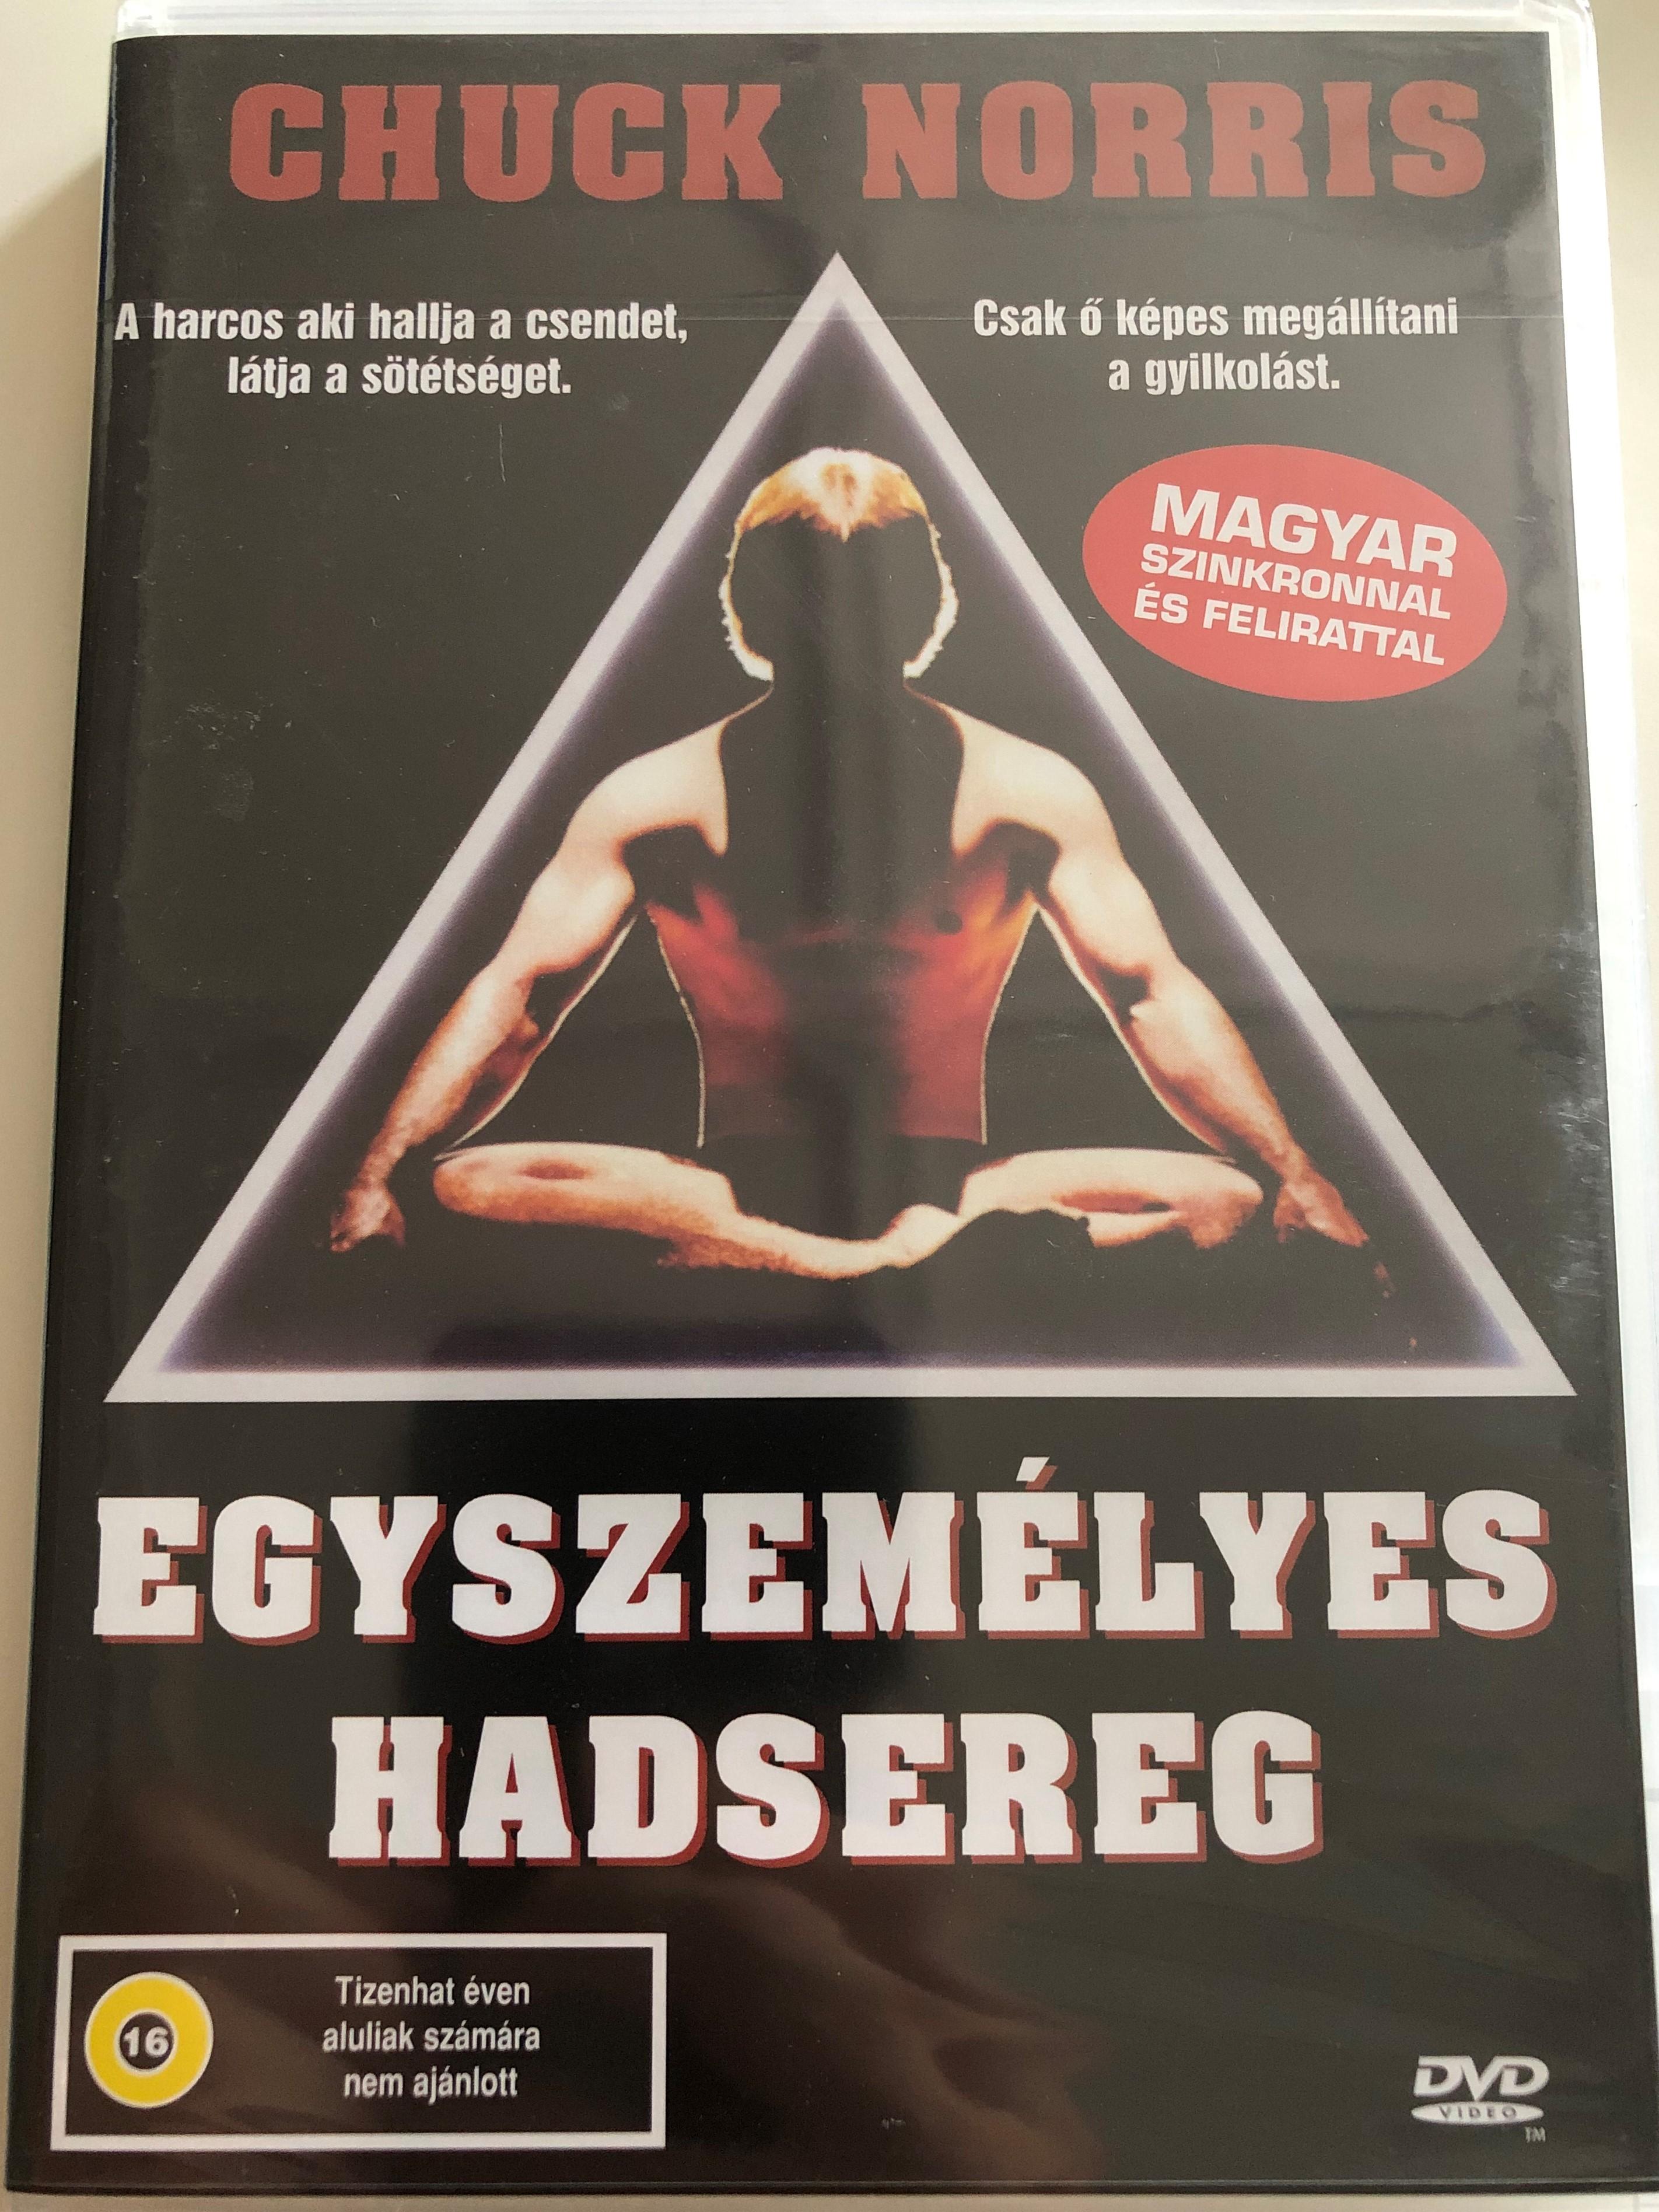 a-force-of-one-dvd-1979-egyszem-lyes-hadsereg-directed-by-paul-aaron-starring-chuck-norris-jennifer-o-neill-james-whitmore-pepe-serna-1-.jpg